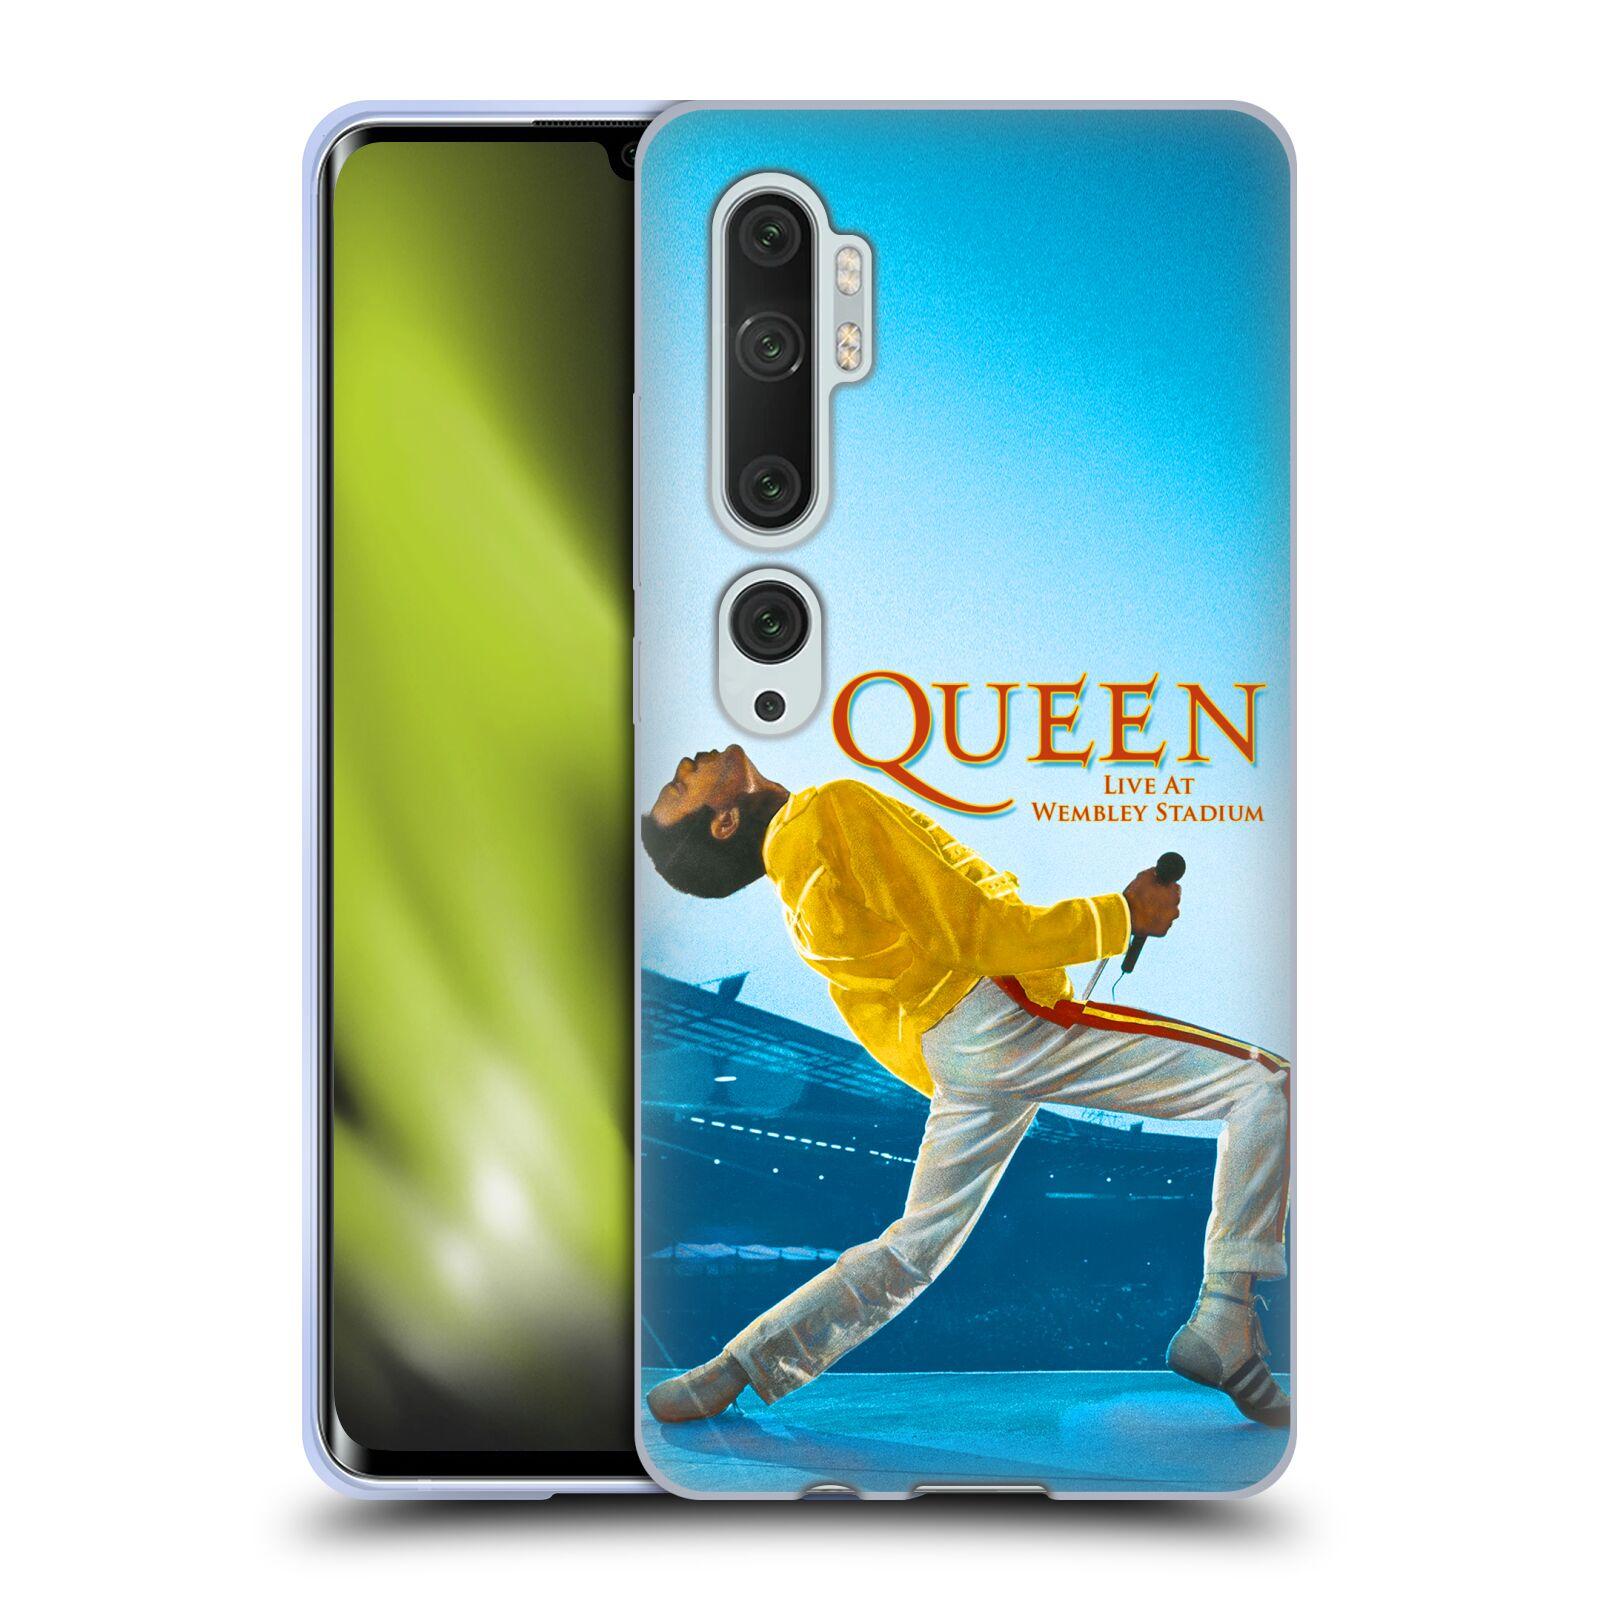 Silikonové pouzdro na mobil Xiaomi Mi Note 10 / 10 Pro - Head Case - Queen - Freddie Mercury